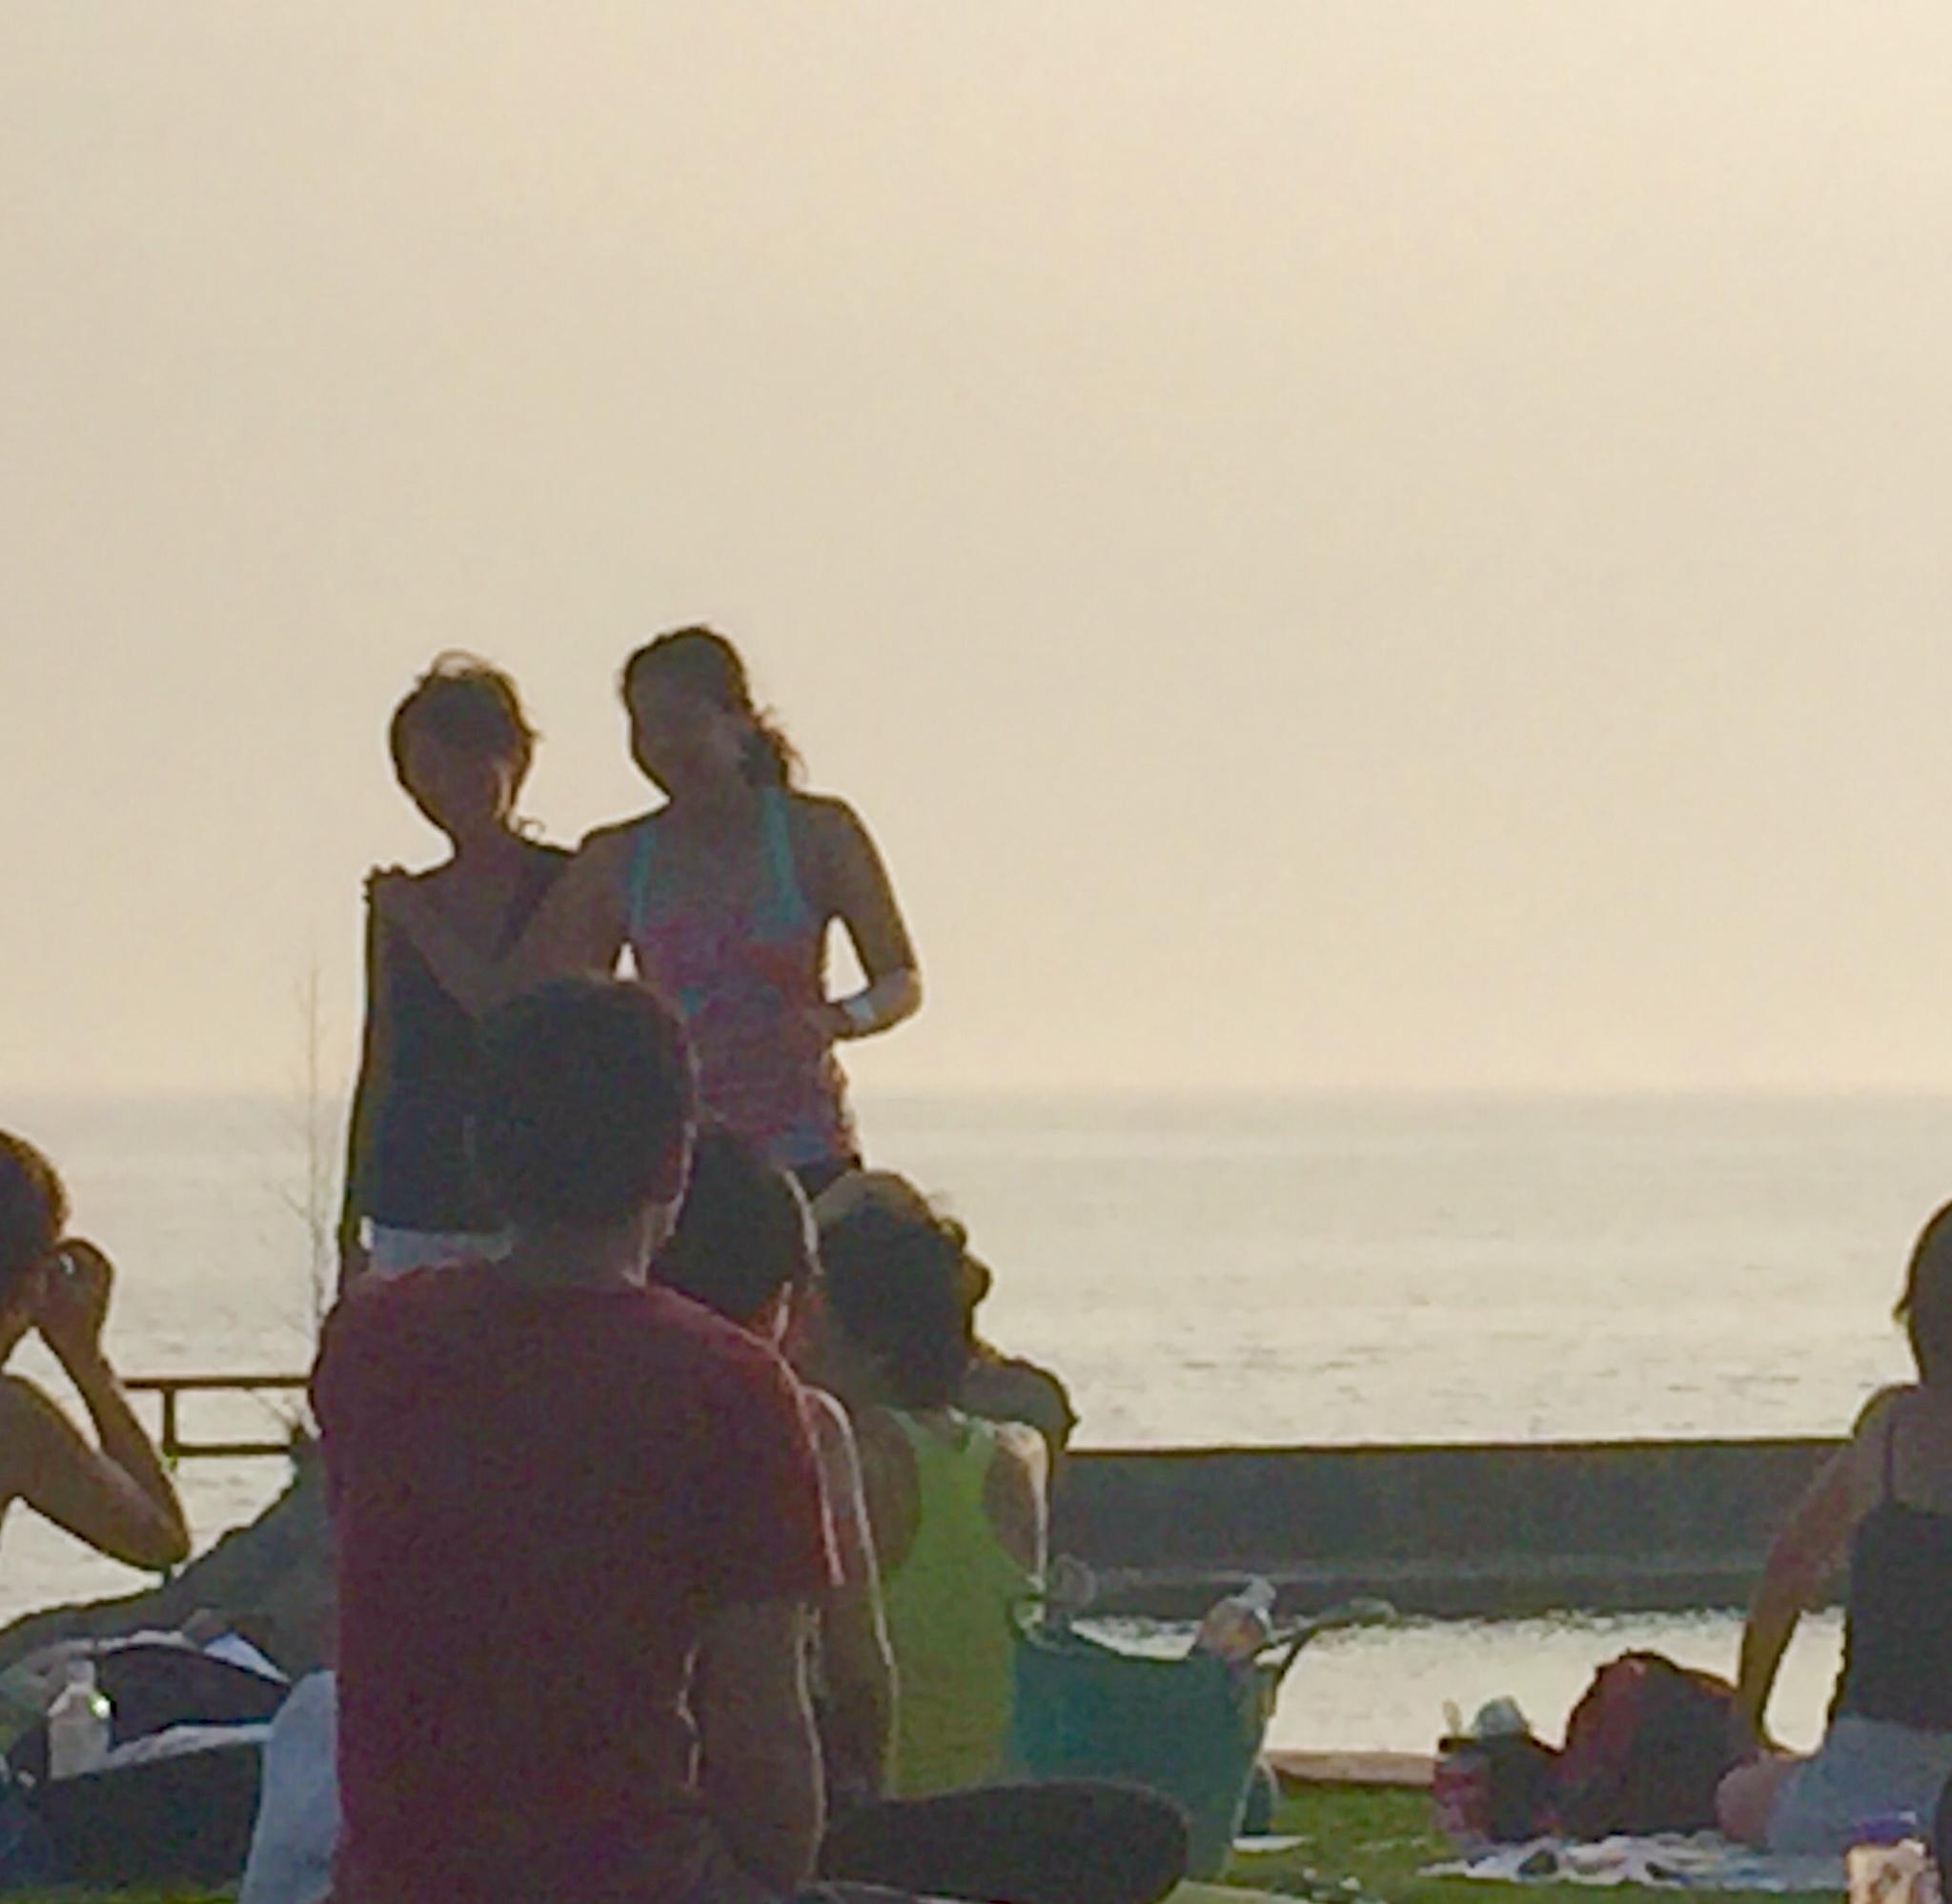 Beach mayu yoga2016  8月〜10月のスケジュール  改定_a0267845_09200550.jpeg